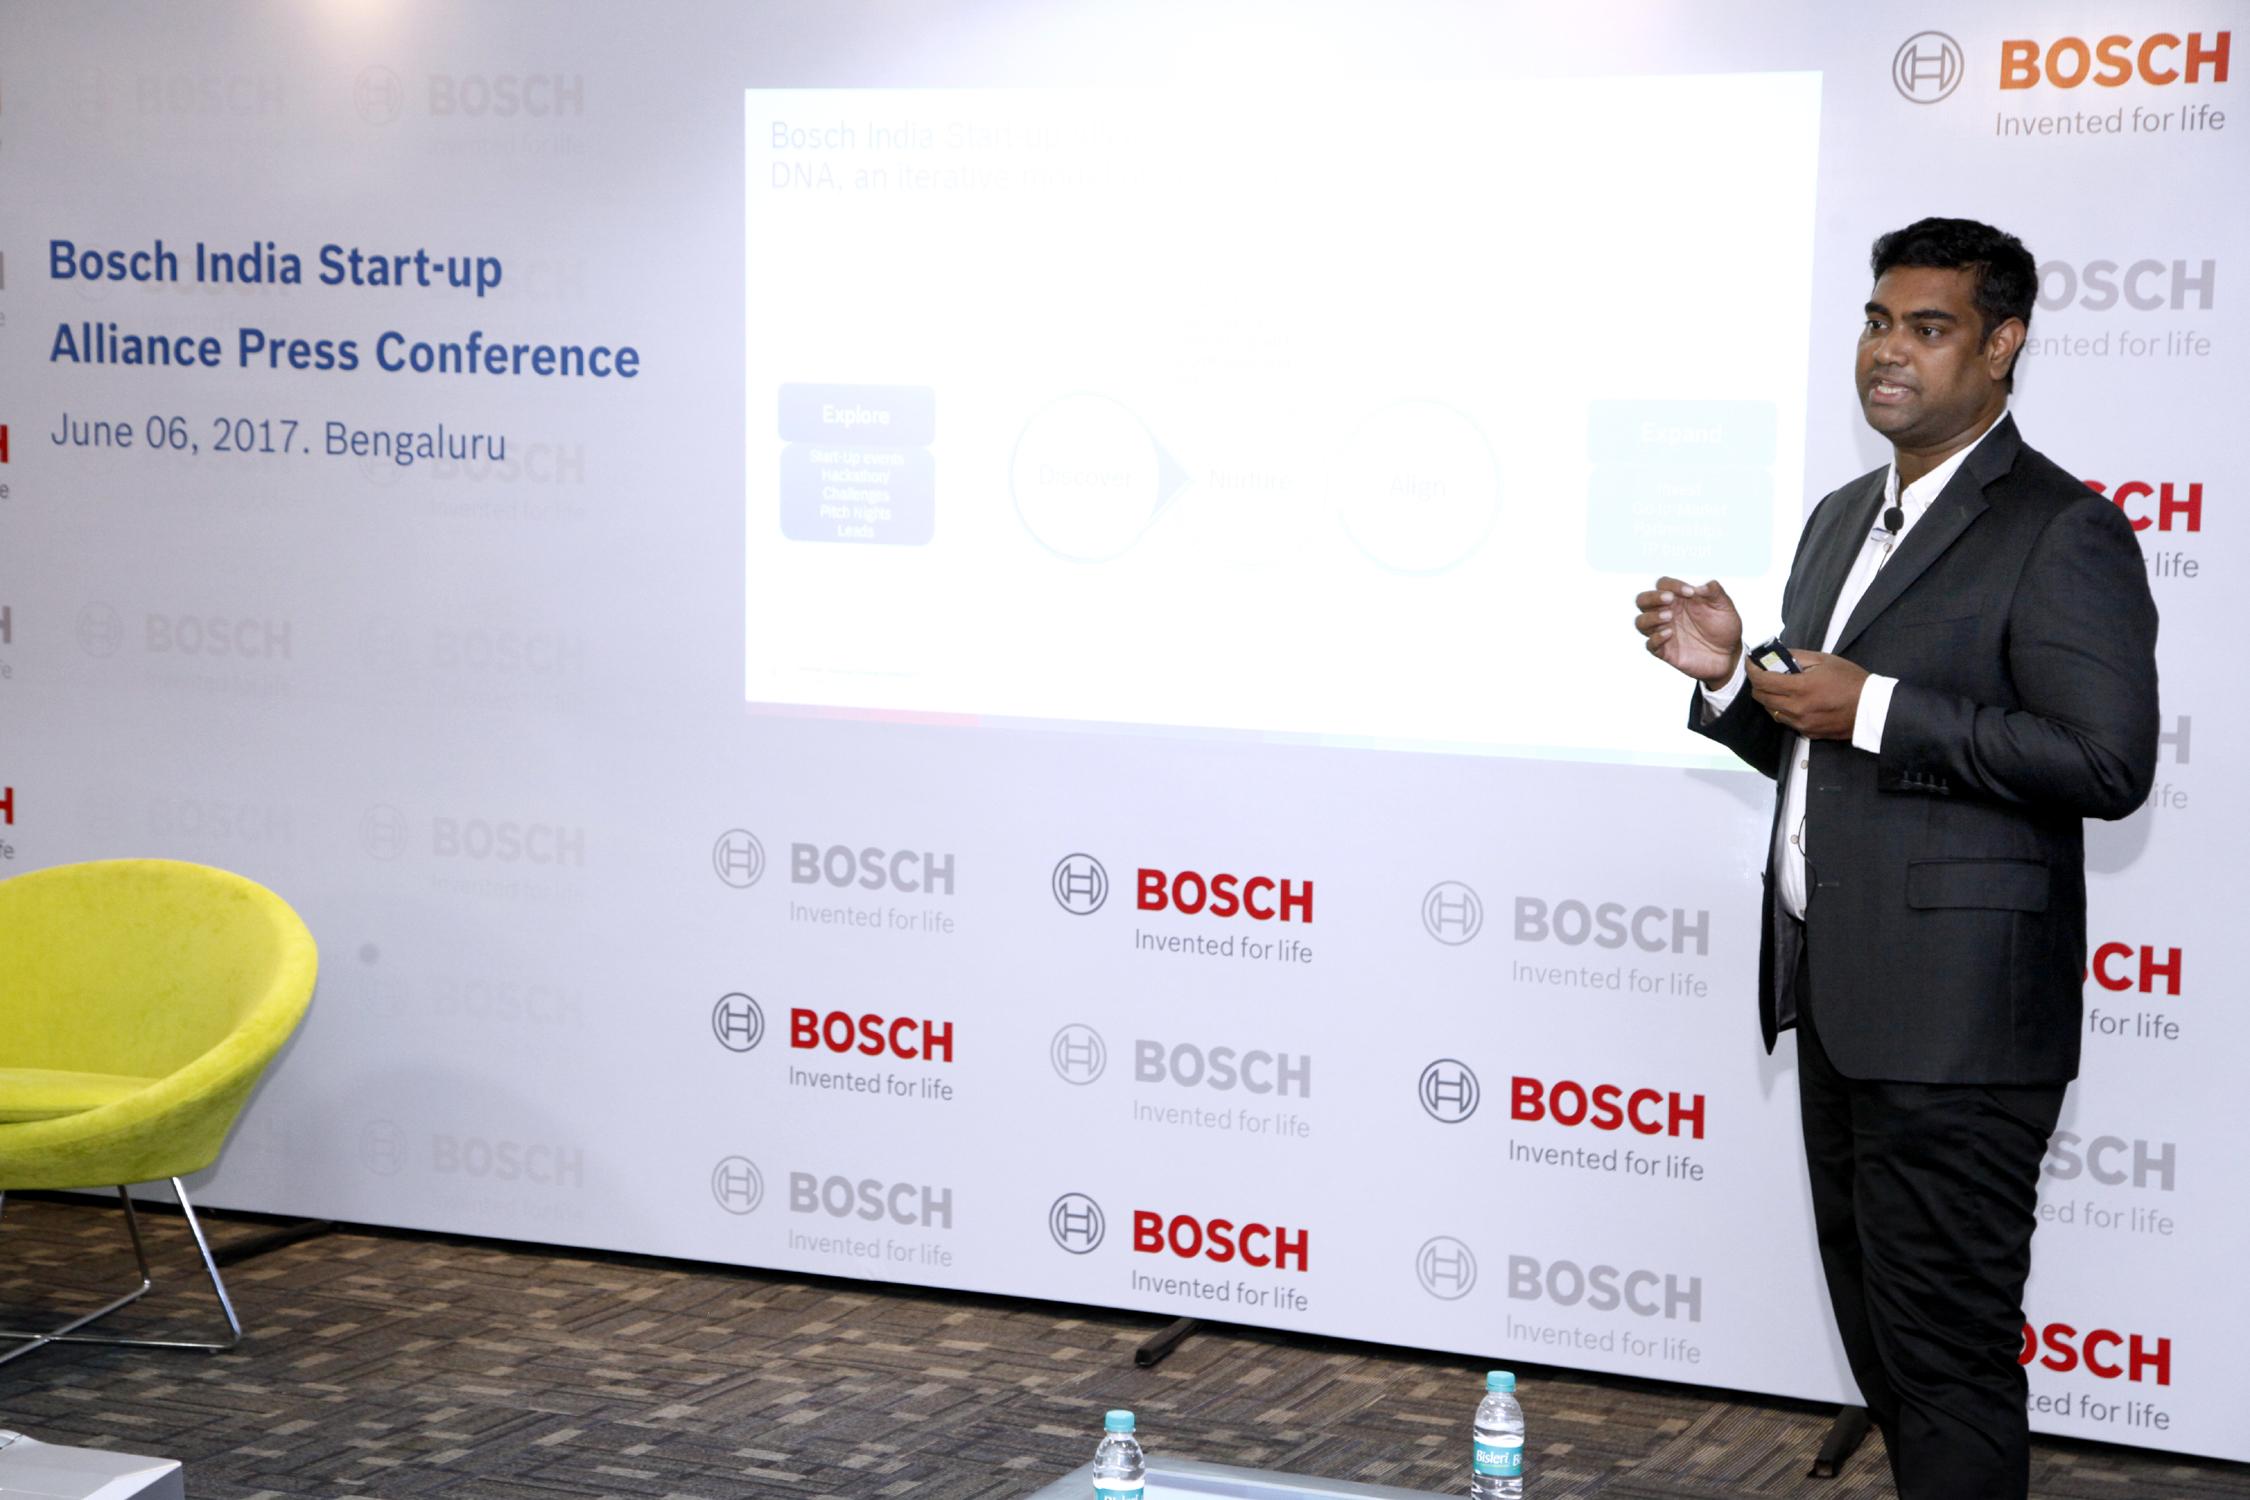 Manohar Esarapu, Leiter des Corporate Venture Program D.N.A. bei Bosch in Indien